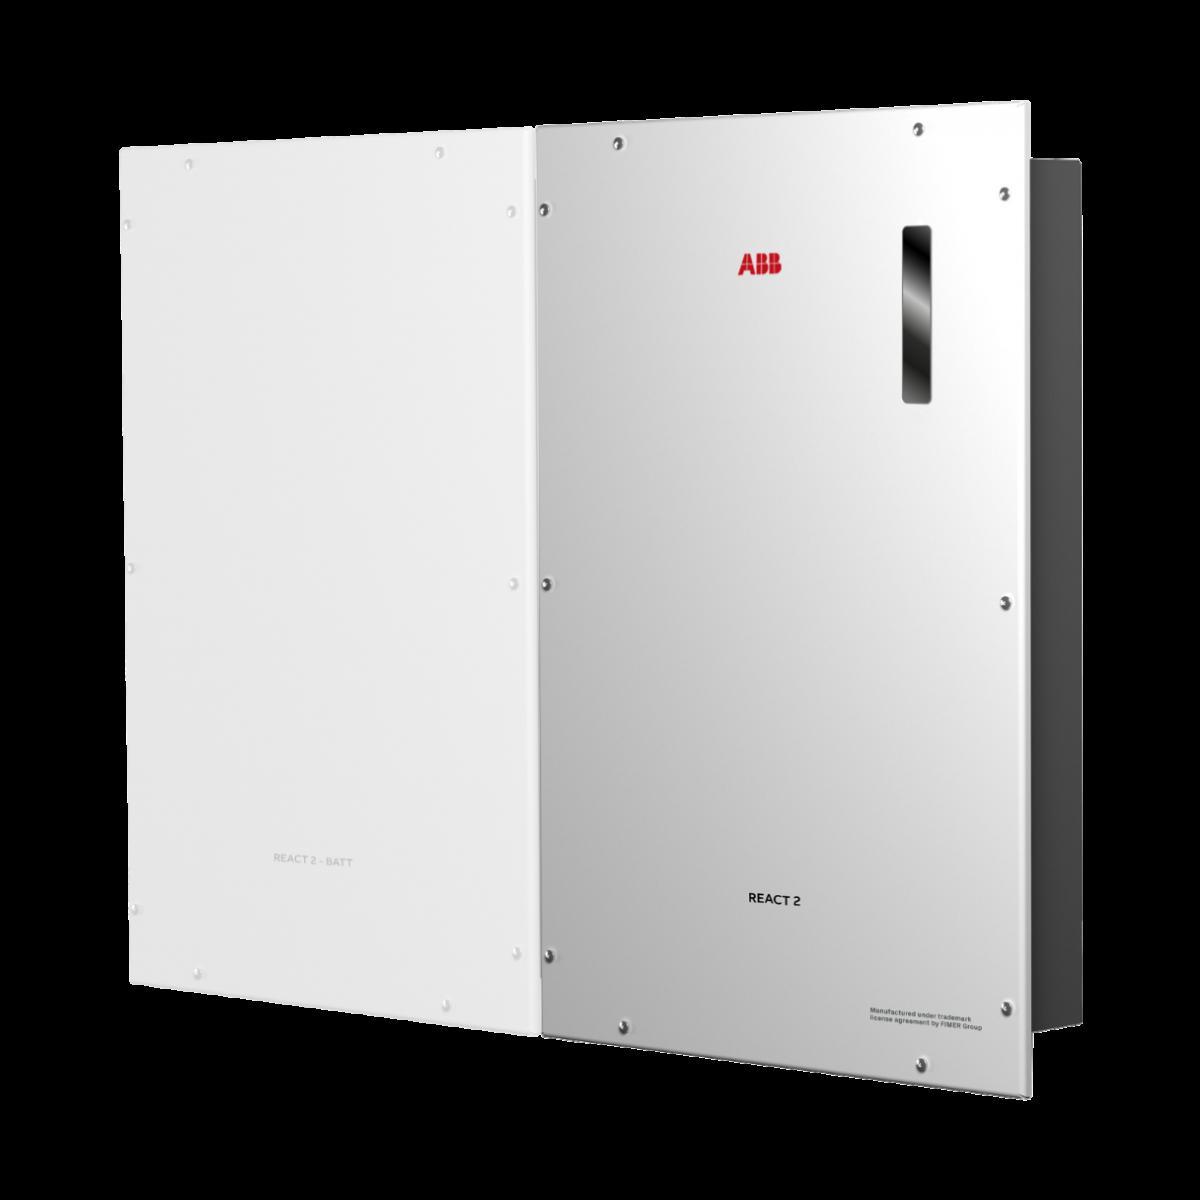 ABB REACT2-UNO-3.6-TL | Hybride Omvormer | 3,6 kW, 1PH